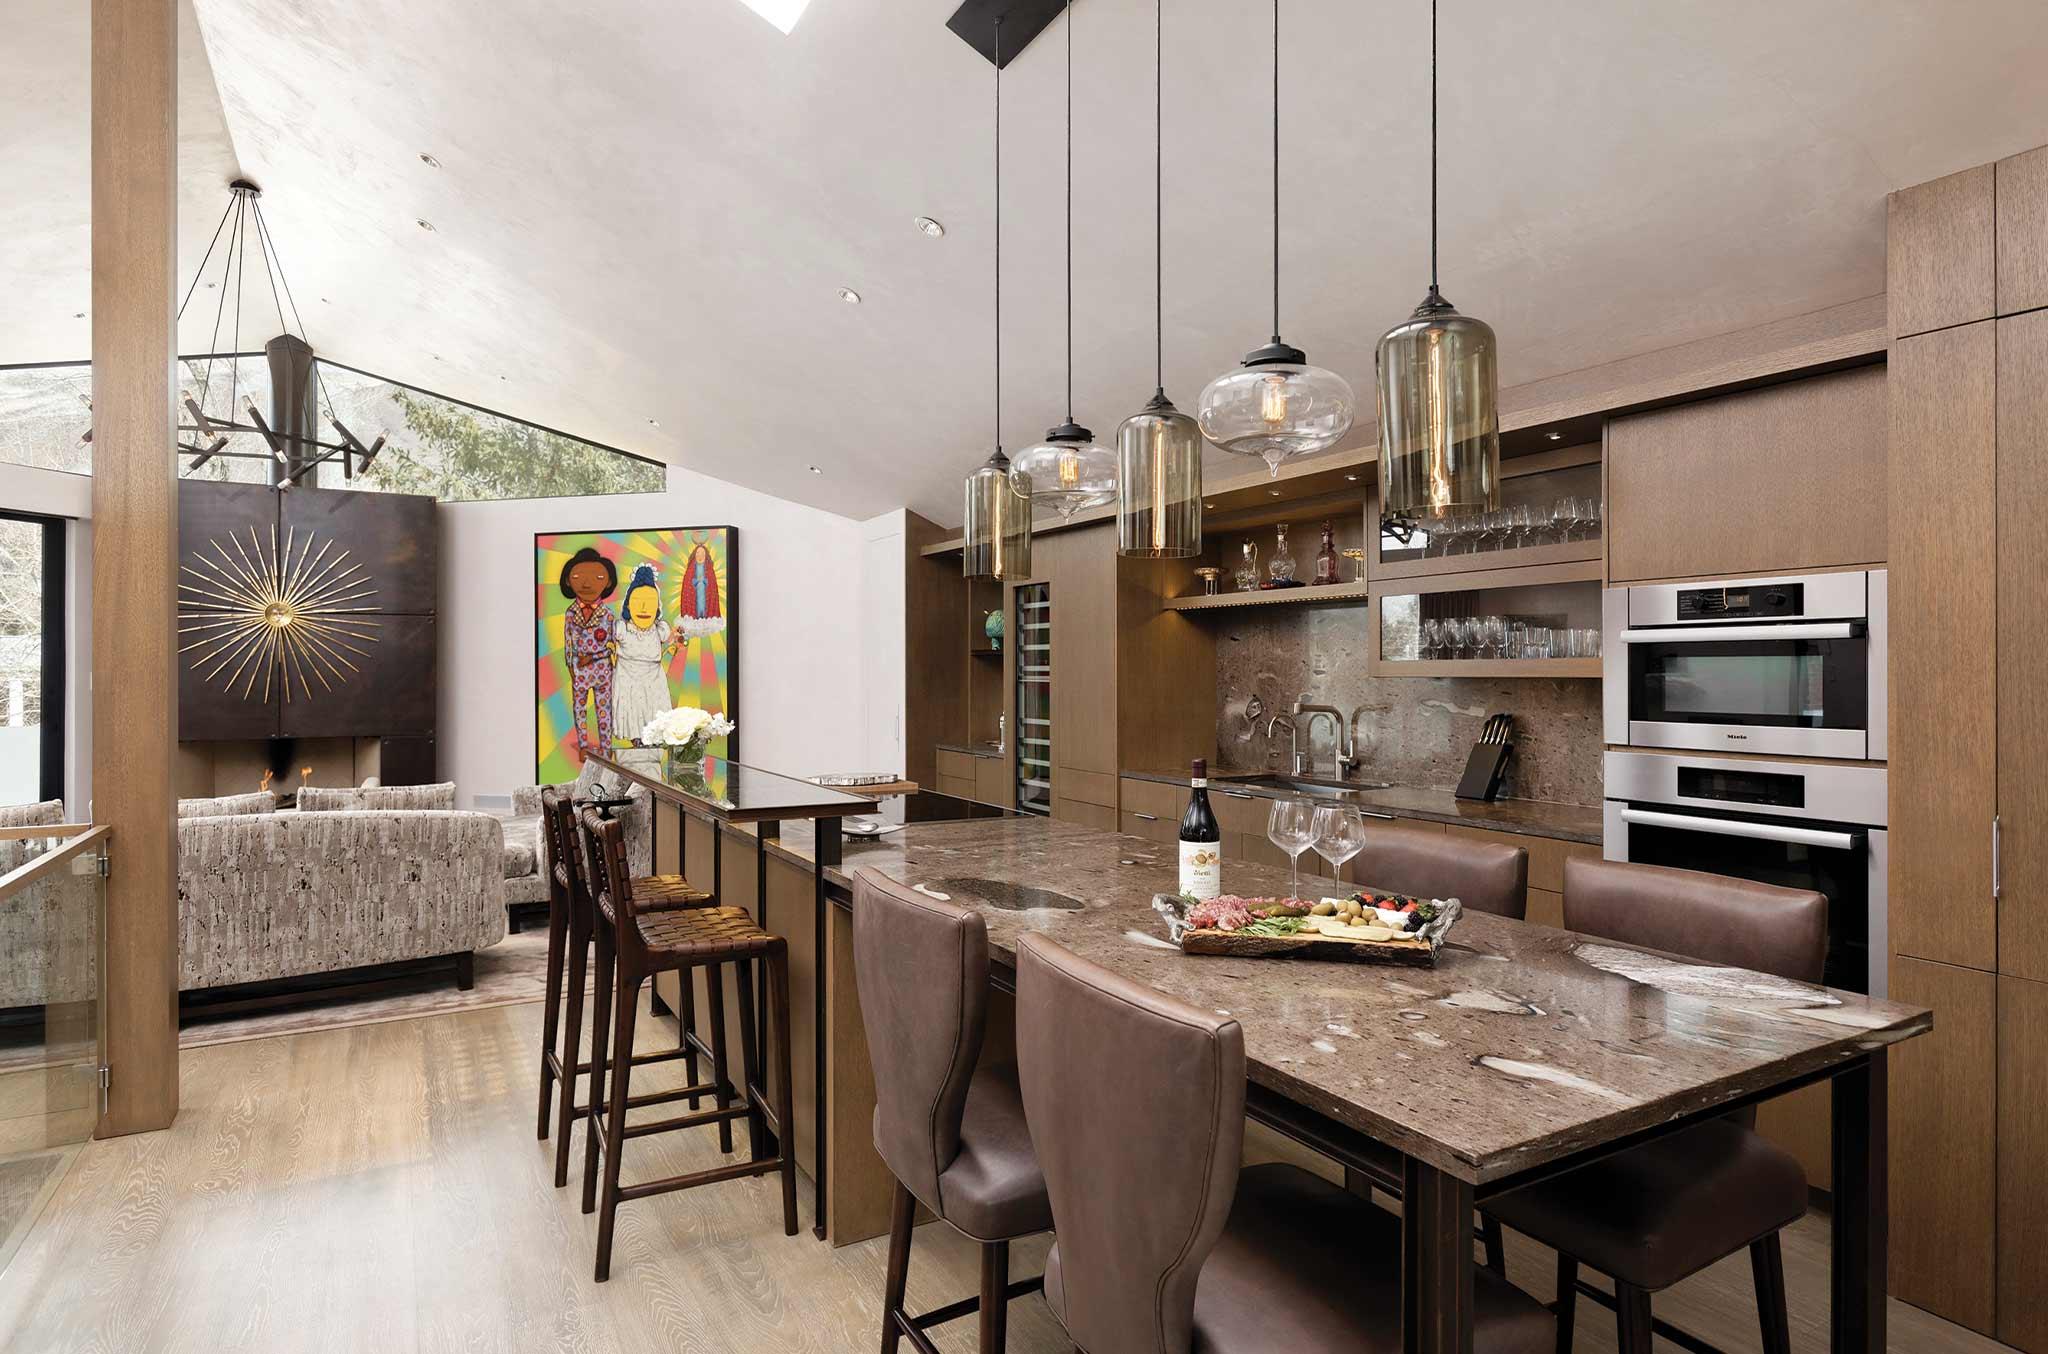 Double Diamond Chalet state-of-the-art kitchen in Aspen luxury rental